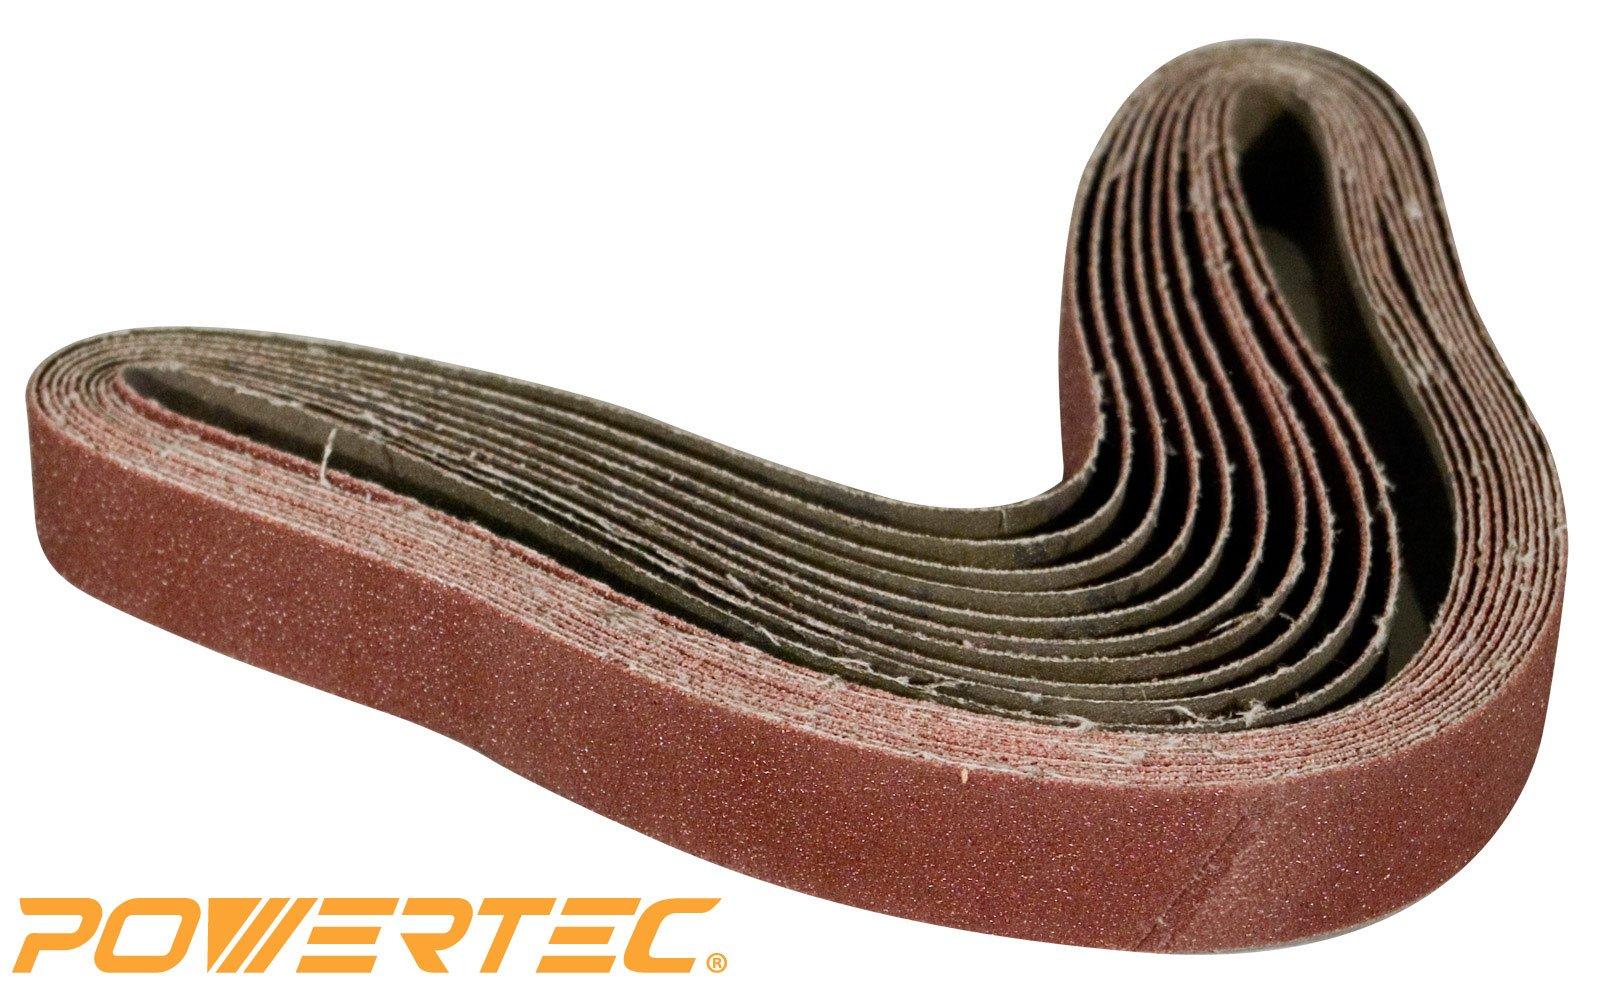 POWERTEC 111530 2-Inch x 72-Inch 240 Grit Aluminum Oxide Sanding Belt, 10-Pack